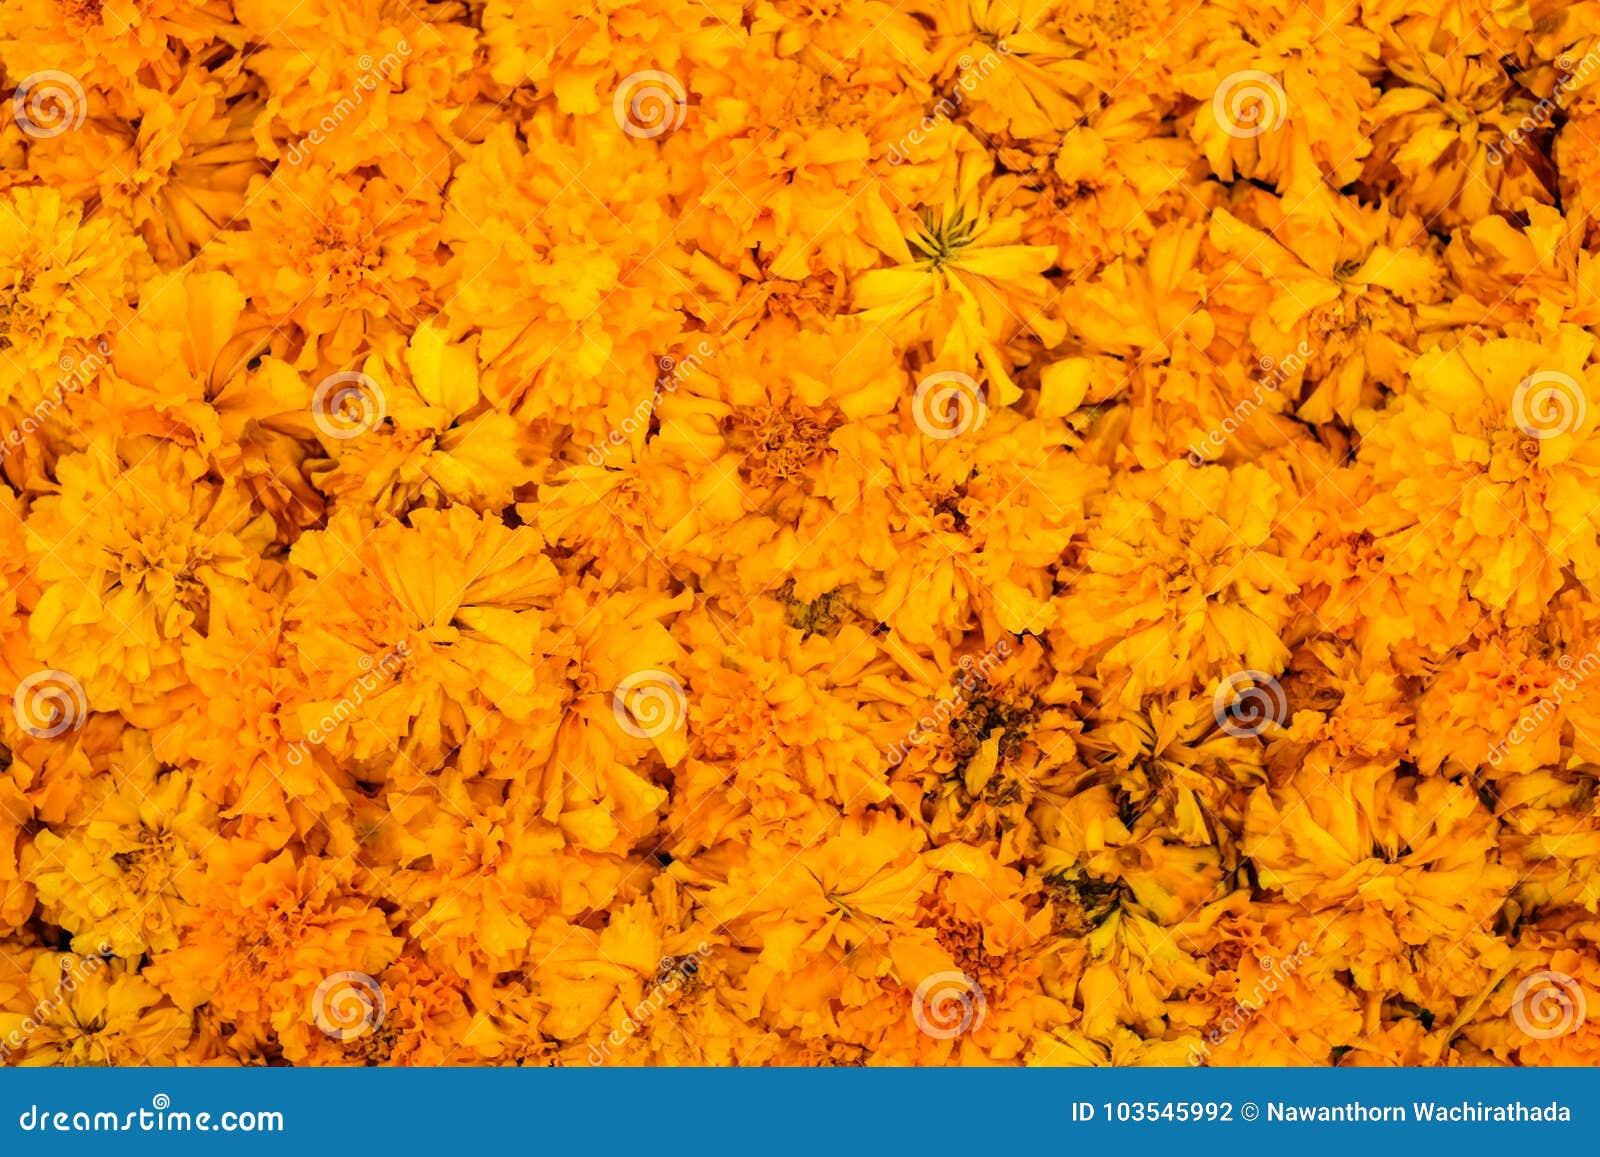 Beautiful Marigold Calendula officinalis for flower background